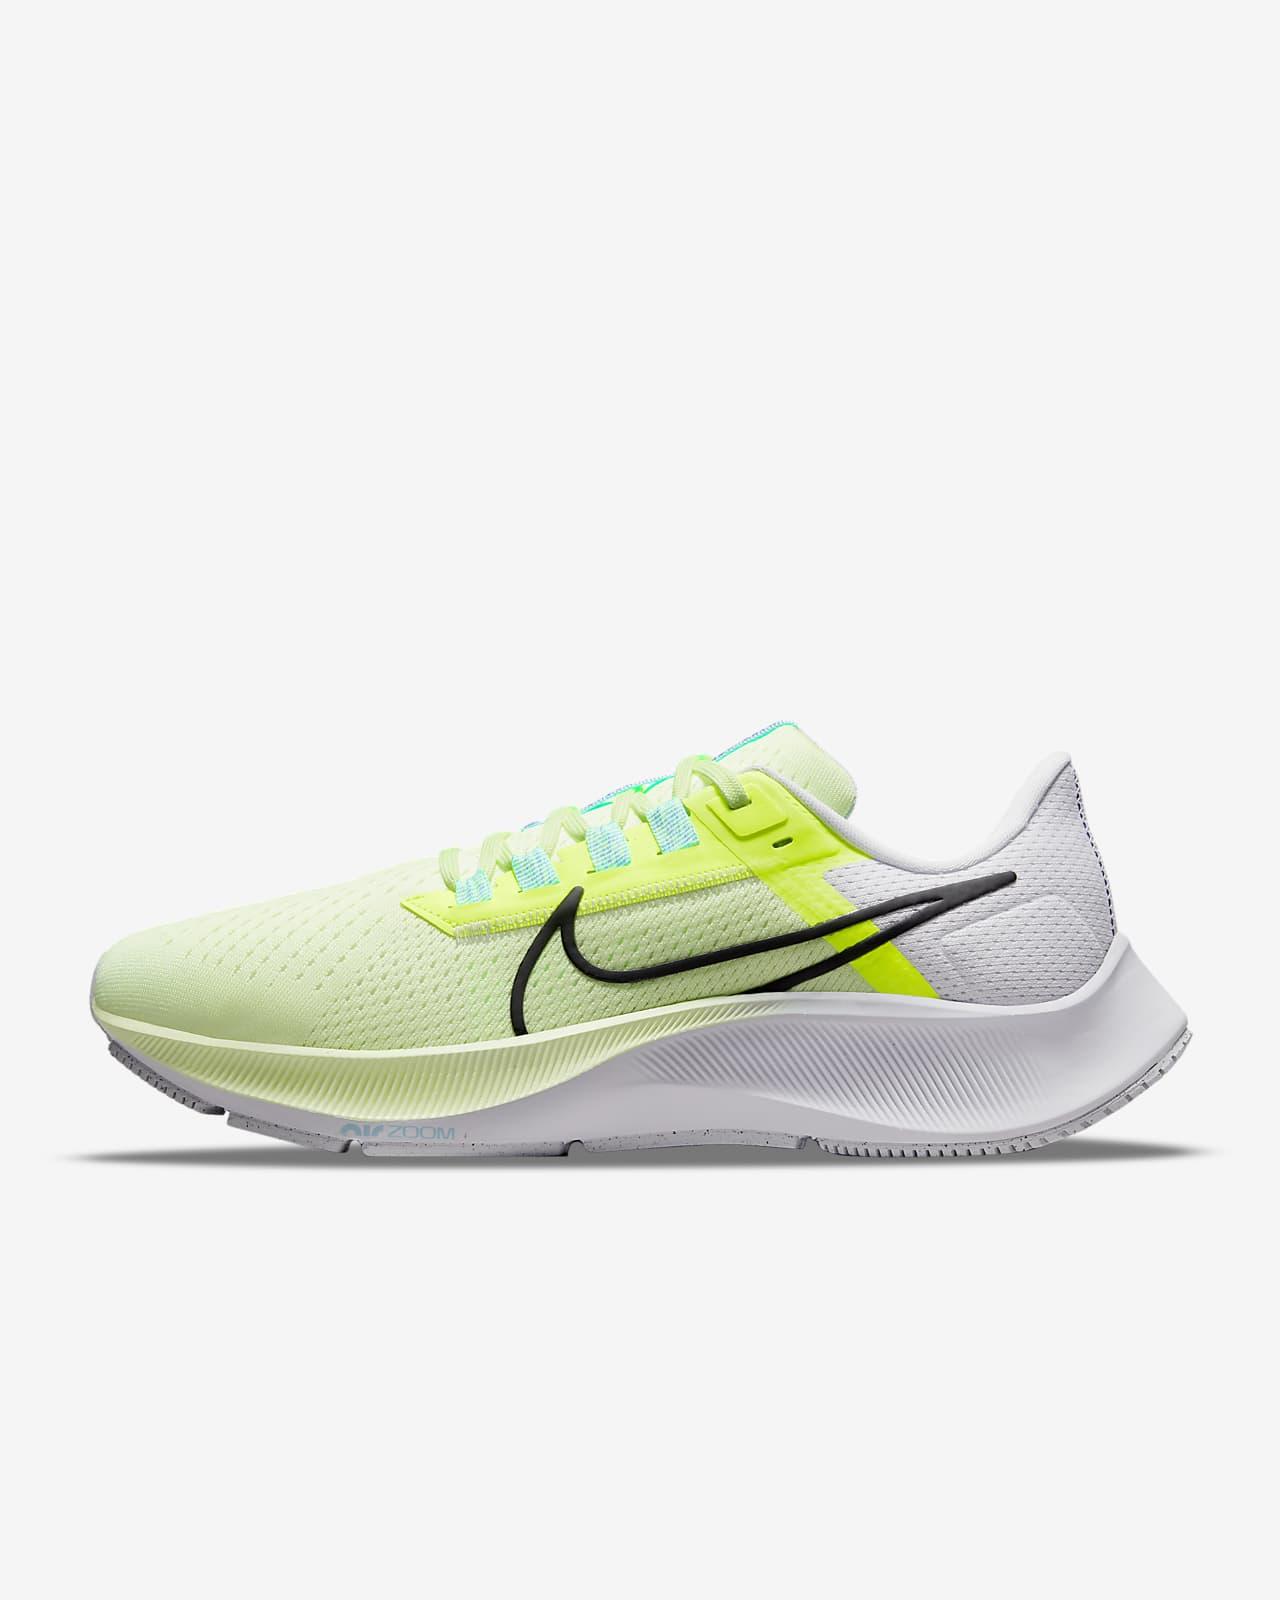 Chaussure de running Nike Air Zoom Pegasus 38 pour Femme